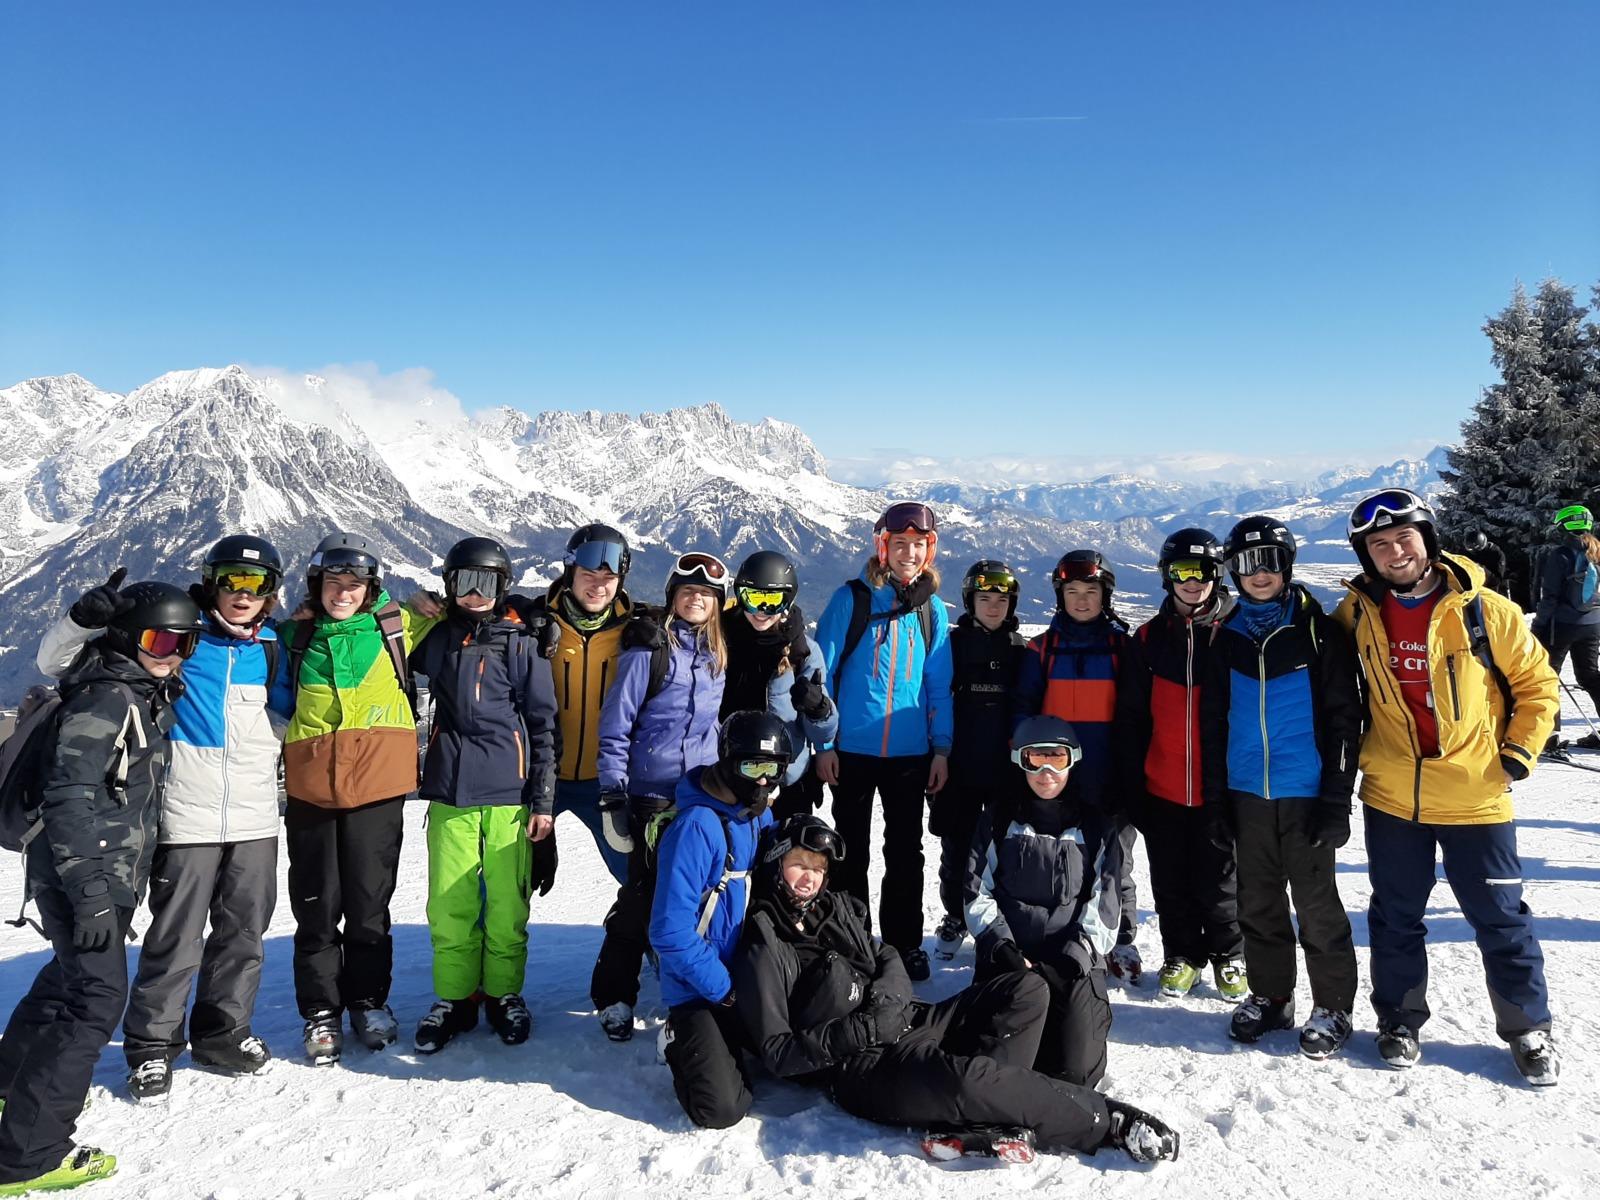 [2022] Super skiwelt in Hopfgarten - Krokus - Hopfgarten